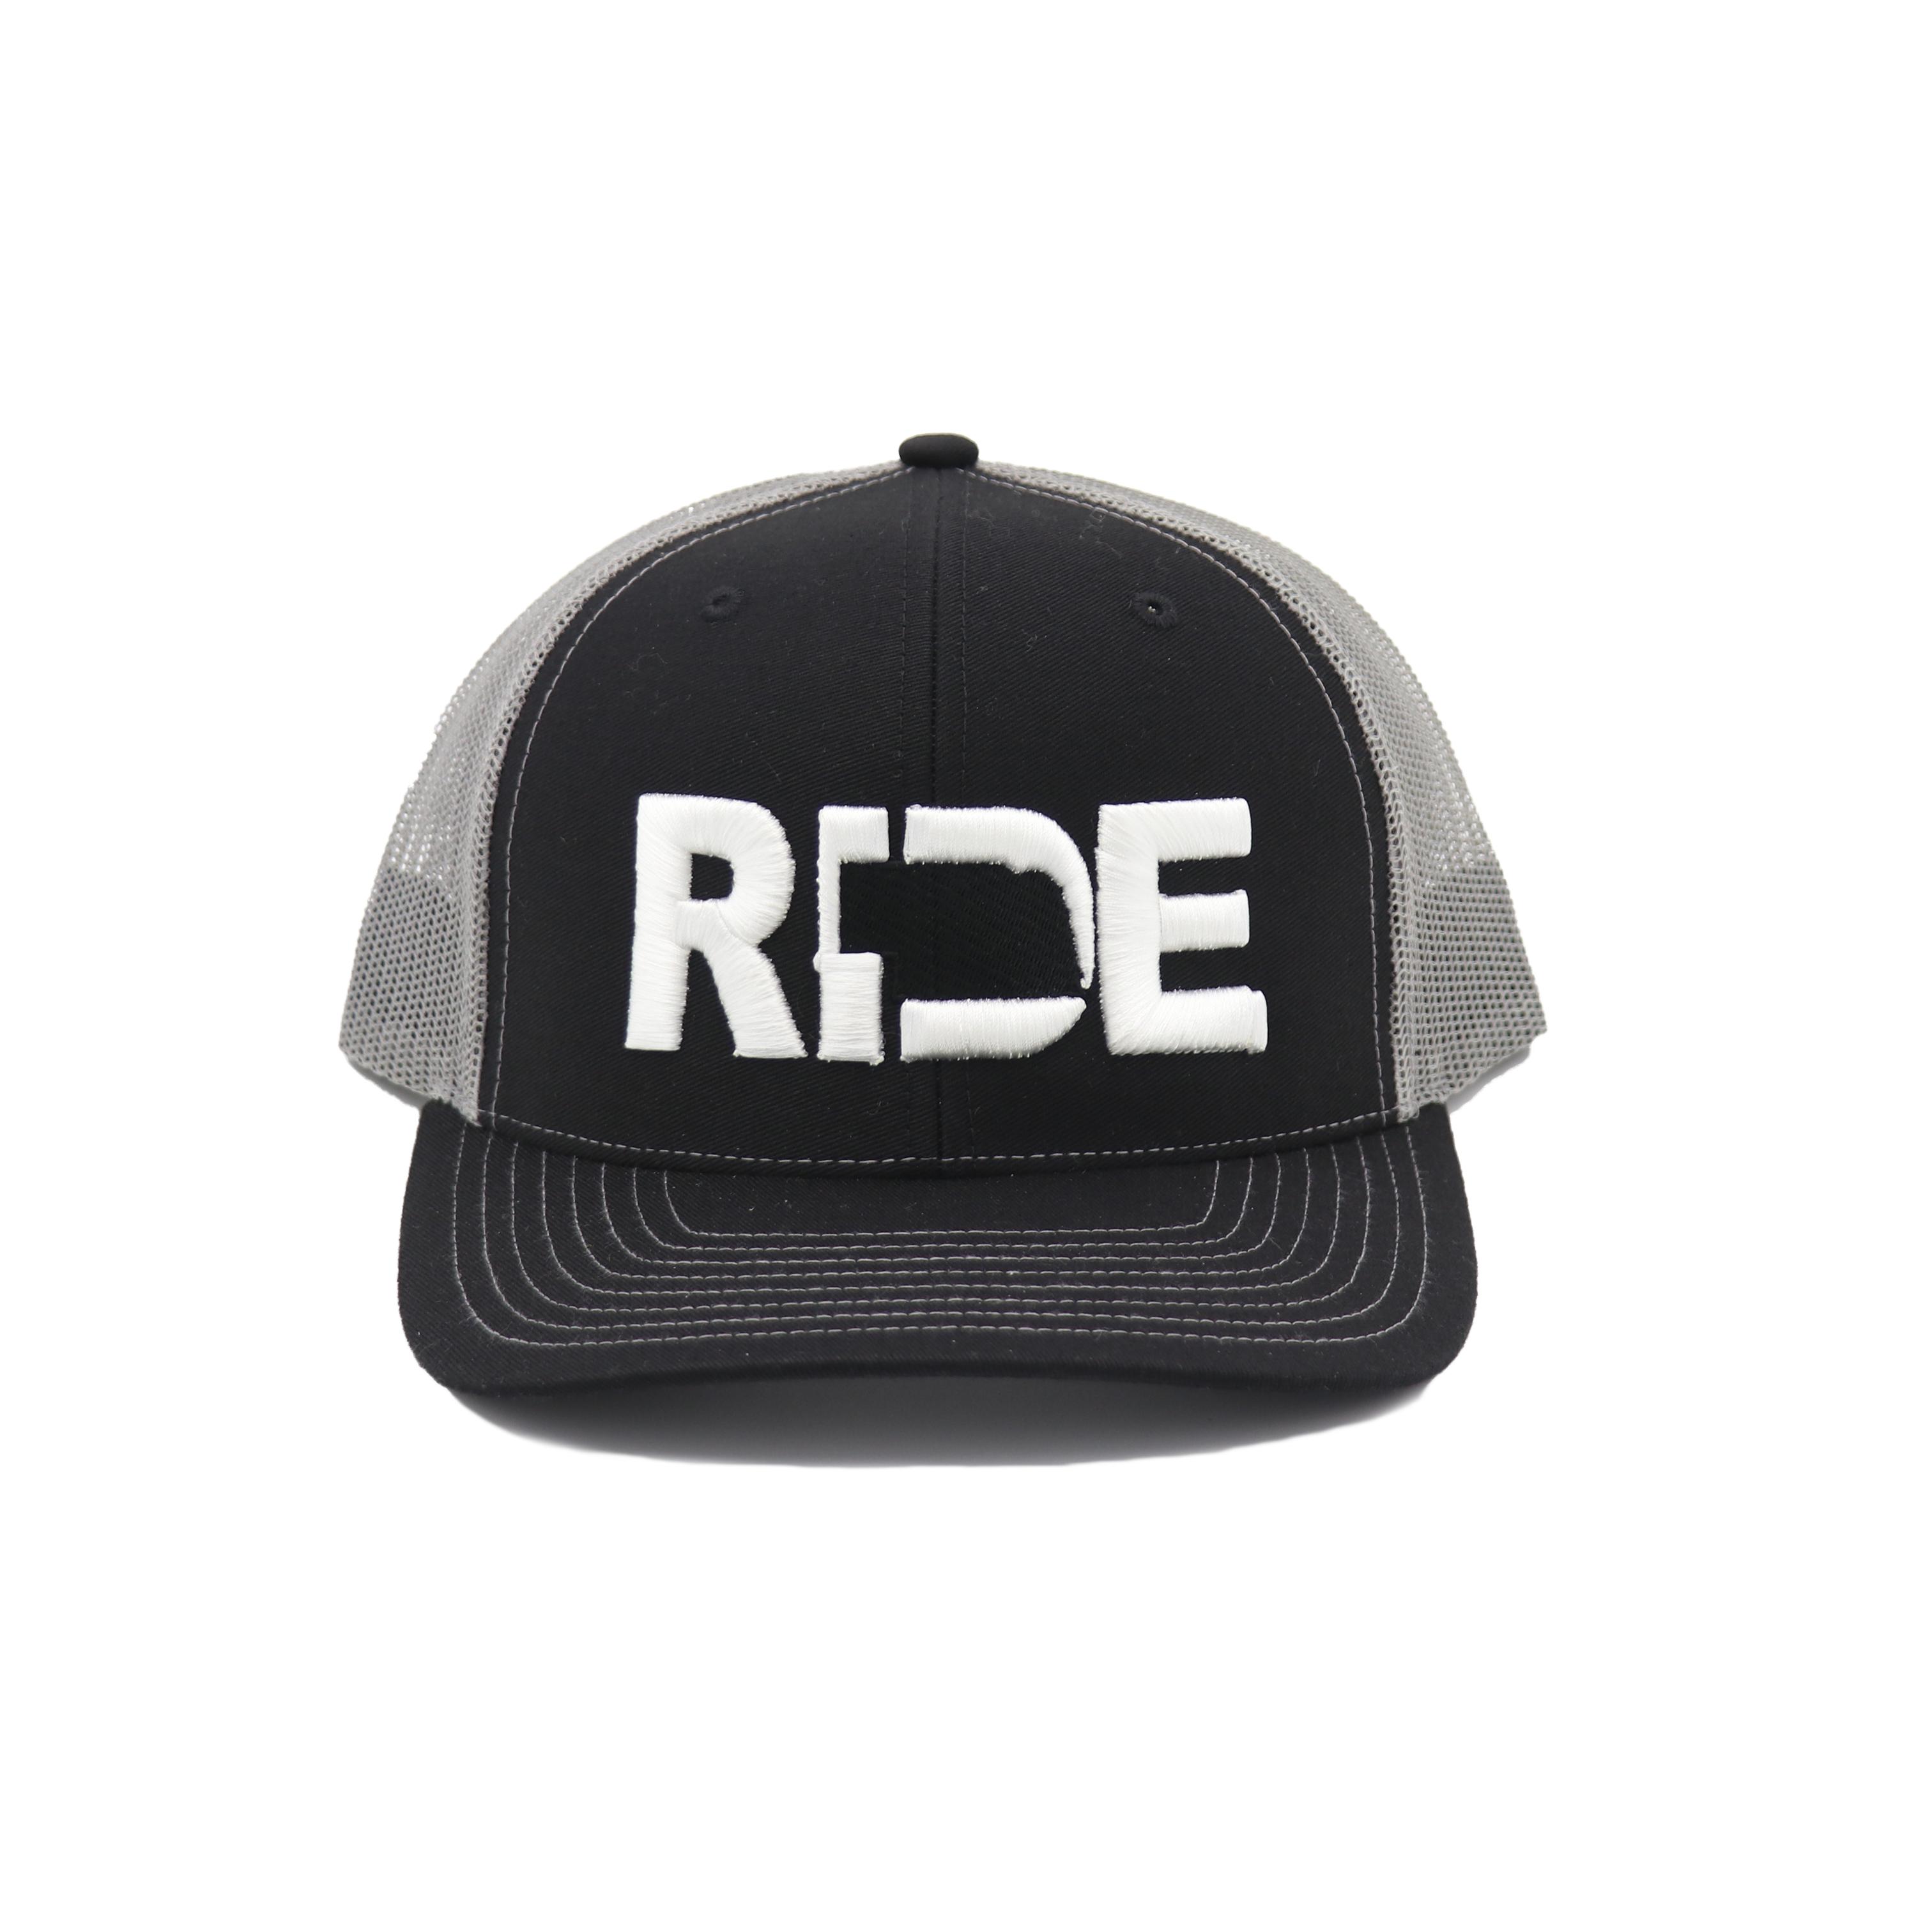 Ride Nebraska Classic Embroidered Snapback Trucker Hat Black/White